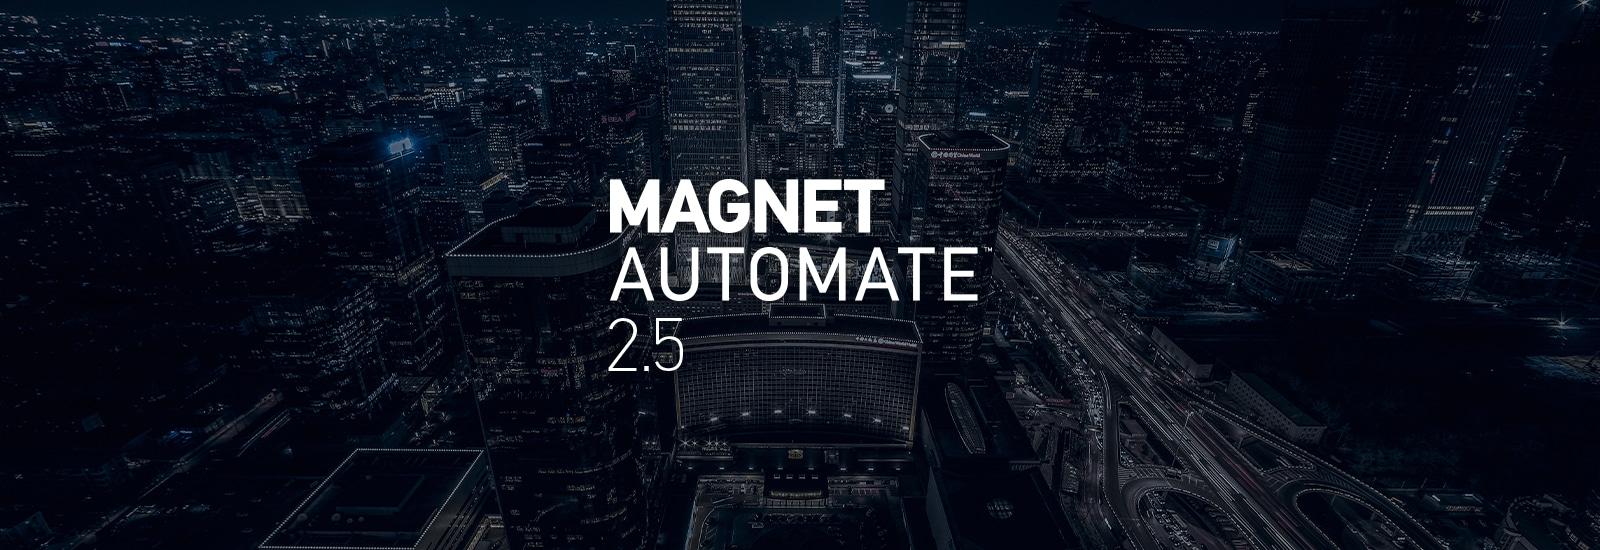 AUTOMATE 2.5